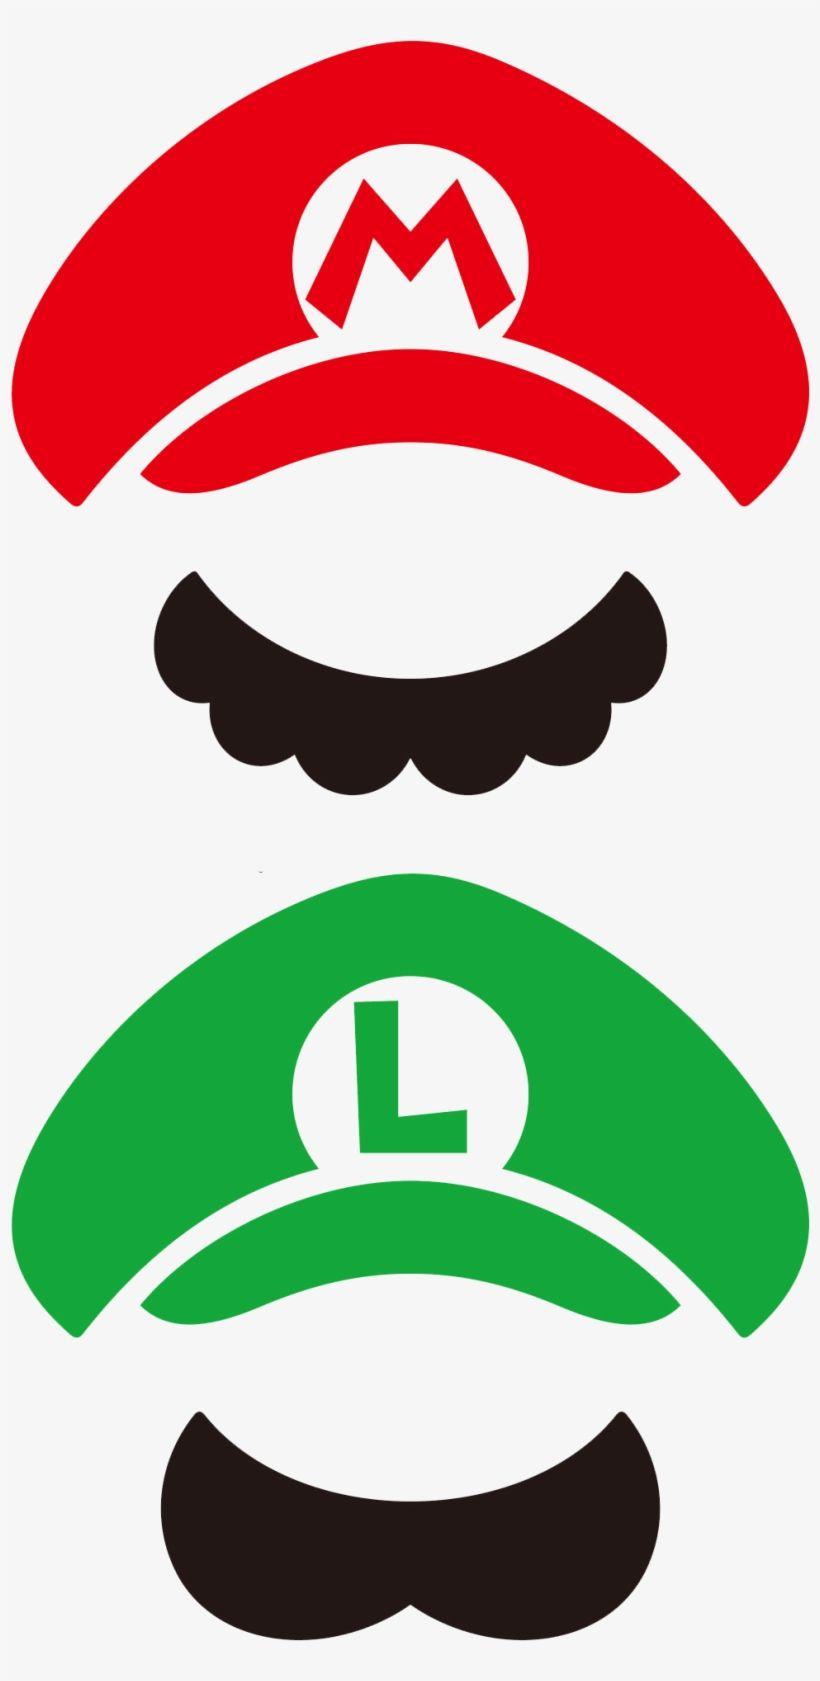 Download Superstar Features Kart Saga Luigi Super Mario Luigi Logo Png Image For Free Search More Cr Super Mario Party Super Mario Birthday Mario Bros Party